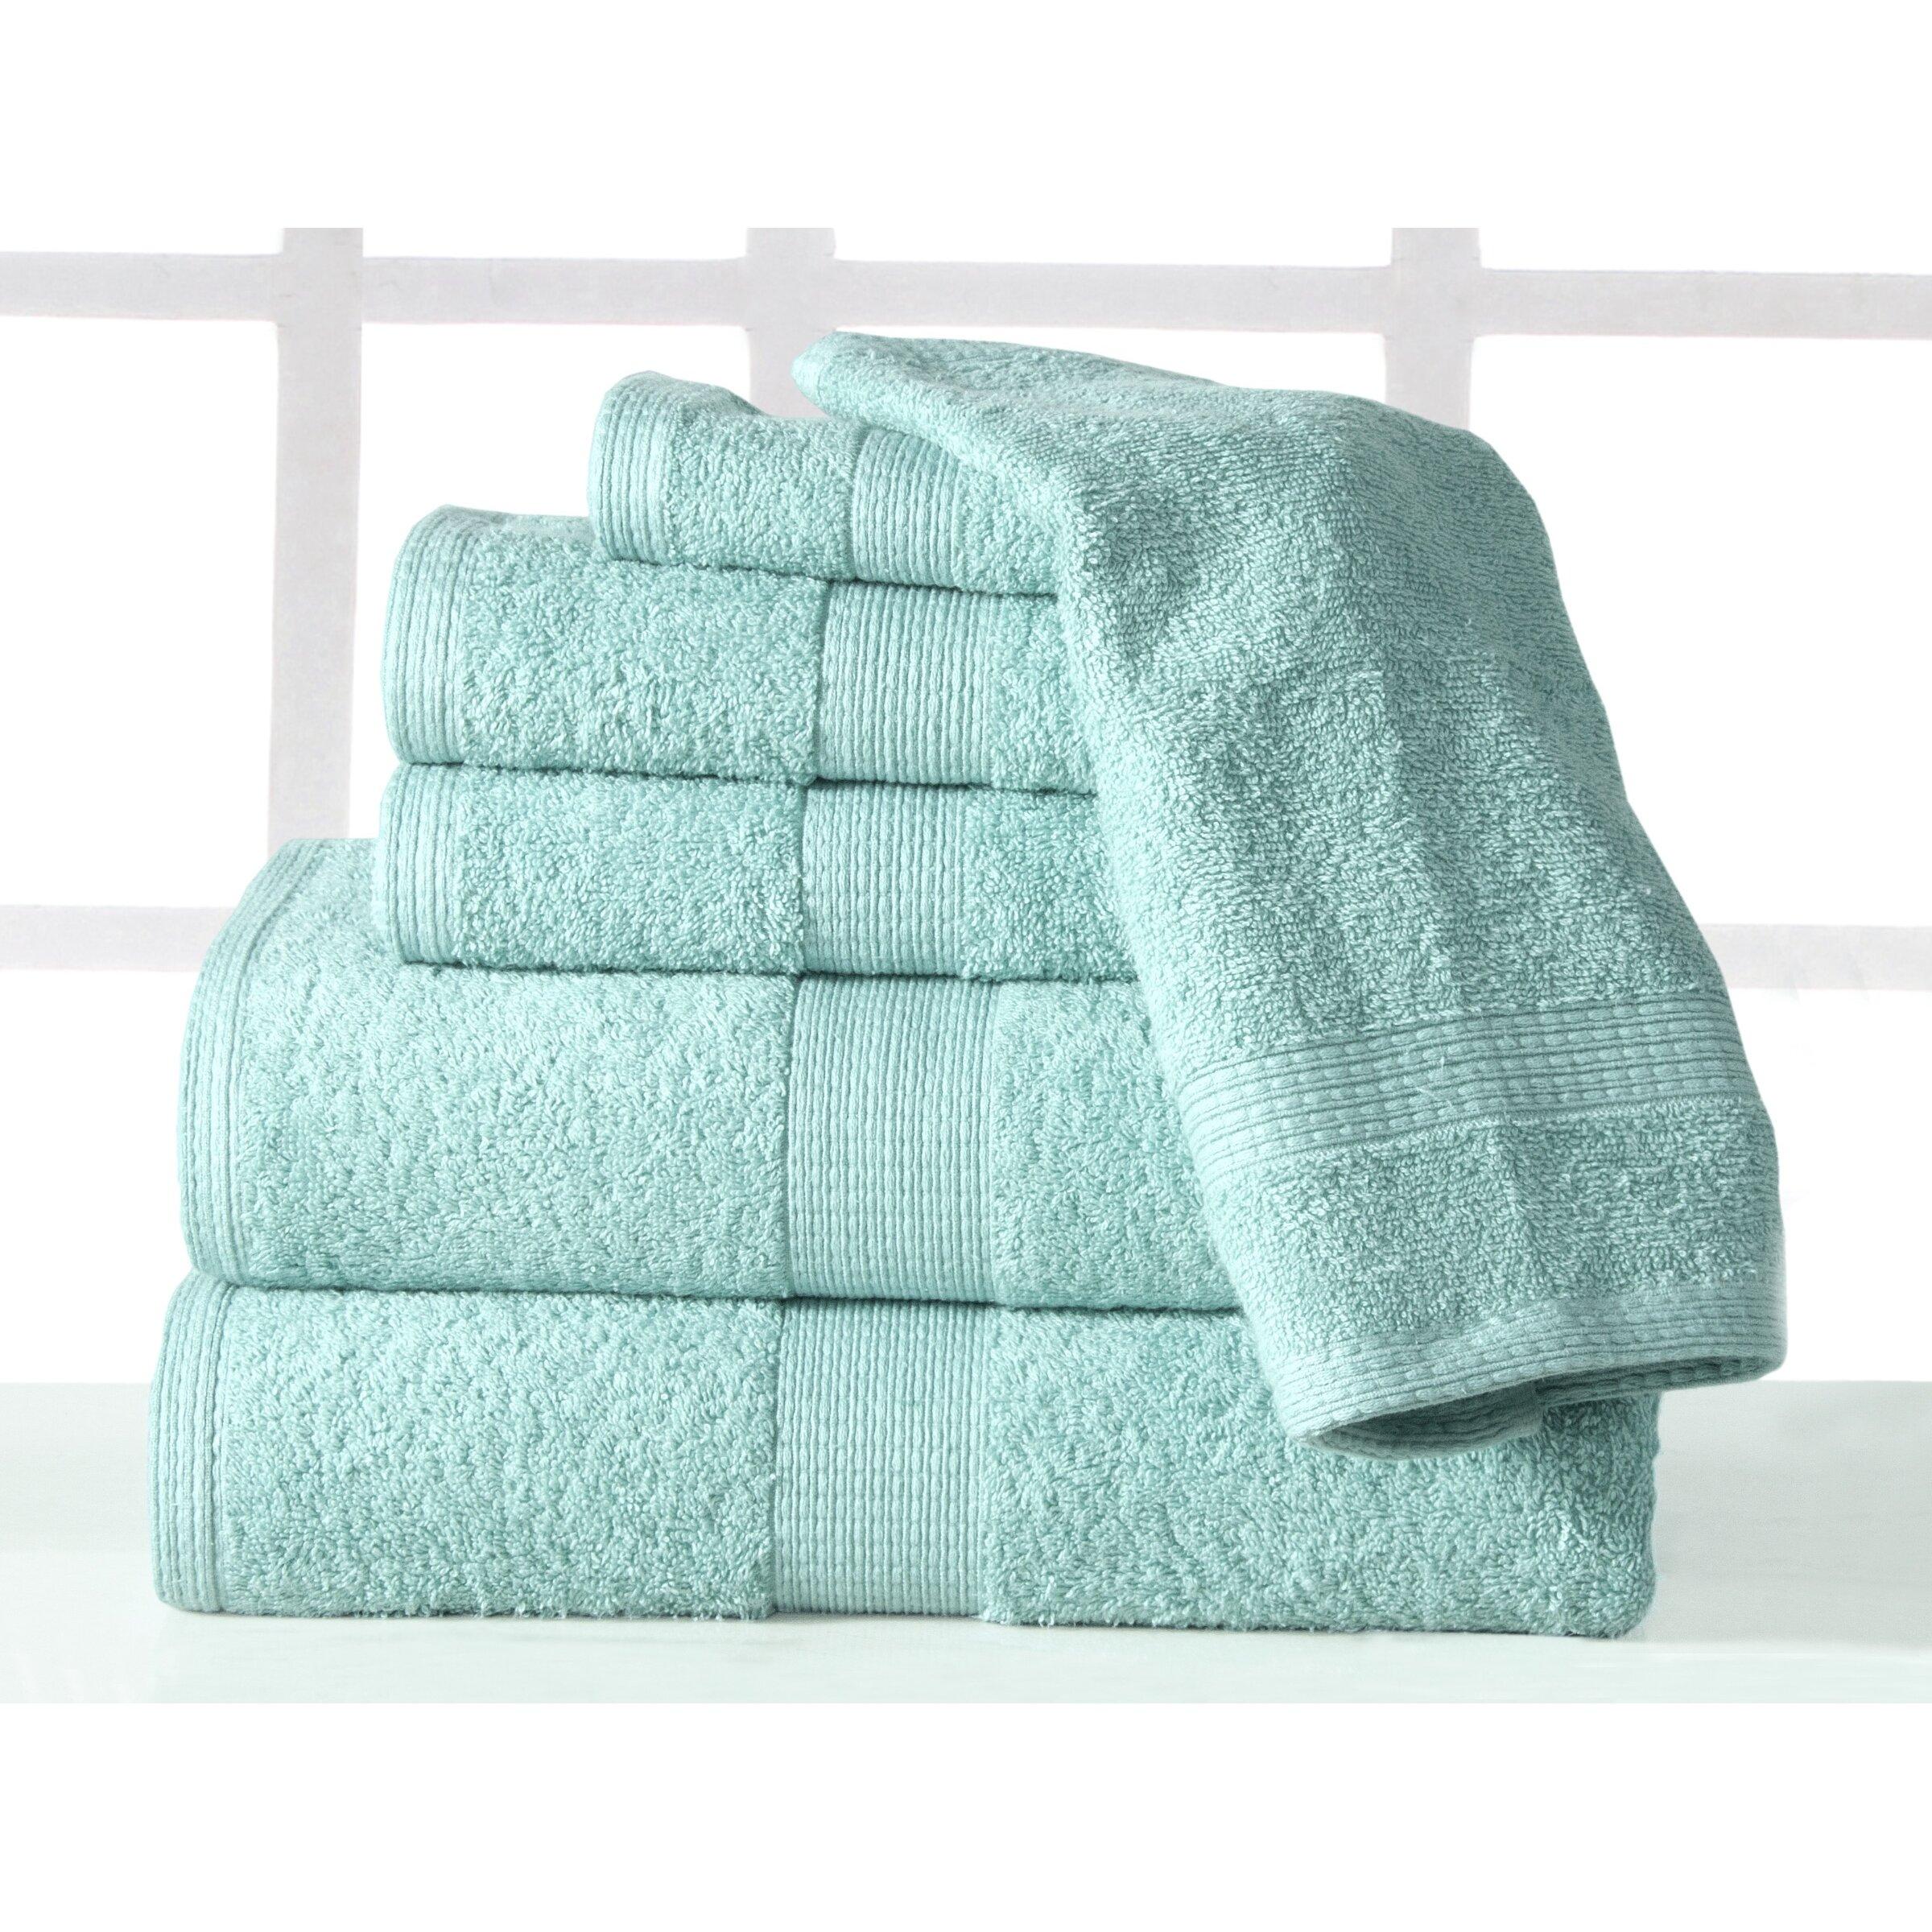 Bathroom Towels Luxury: Affinity Linens Supersoft Plush 6 Piece Towel Set